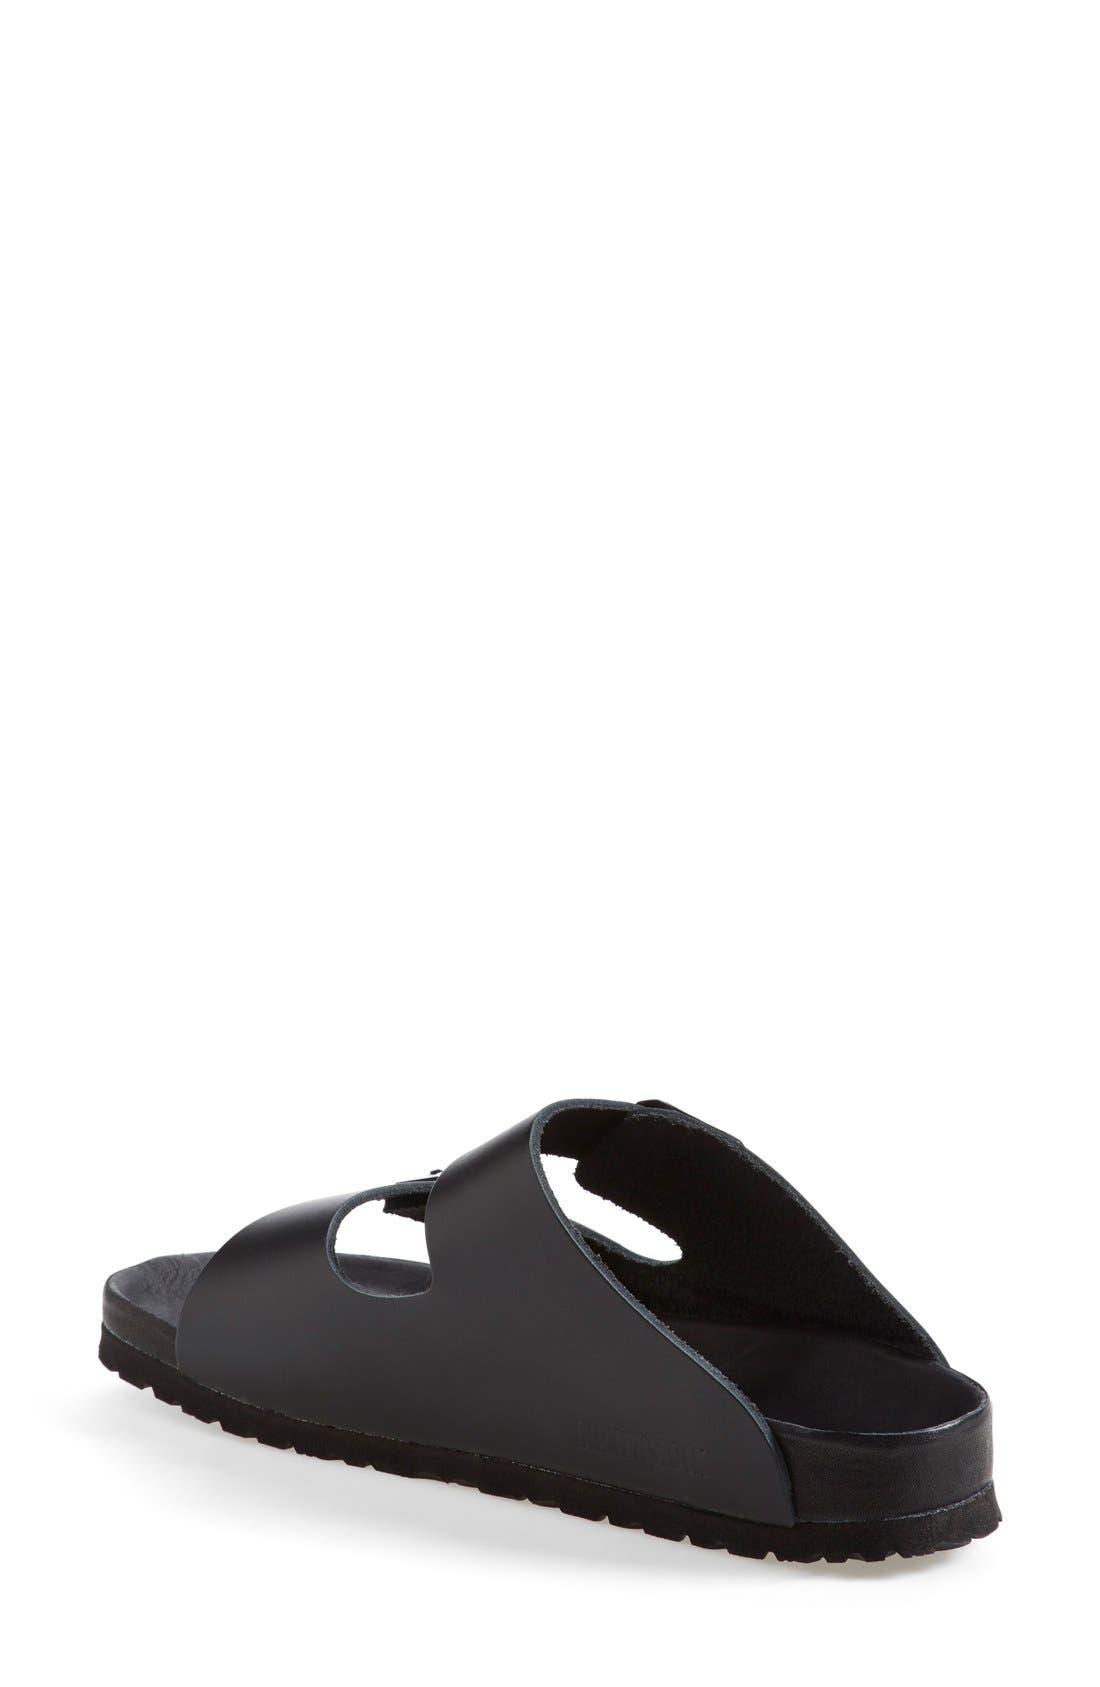 Alternate Image 2  - Birkenstock 'Monterey' Leather Sandal